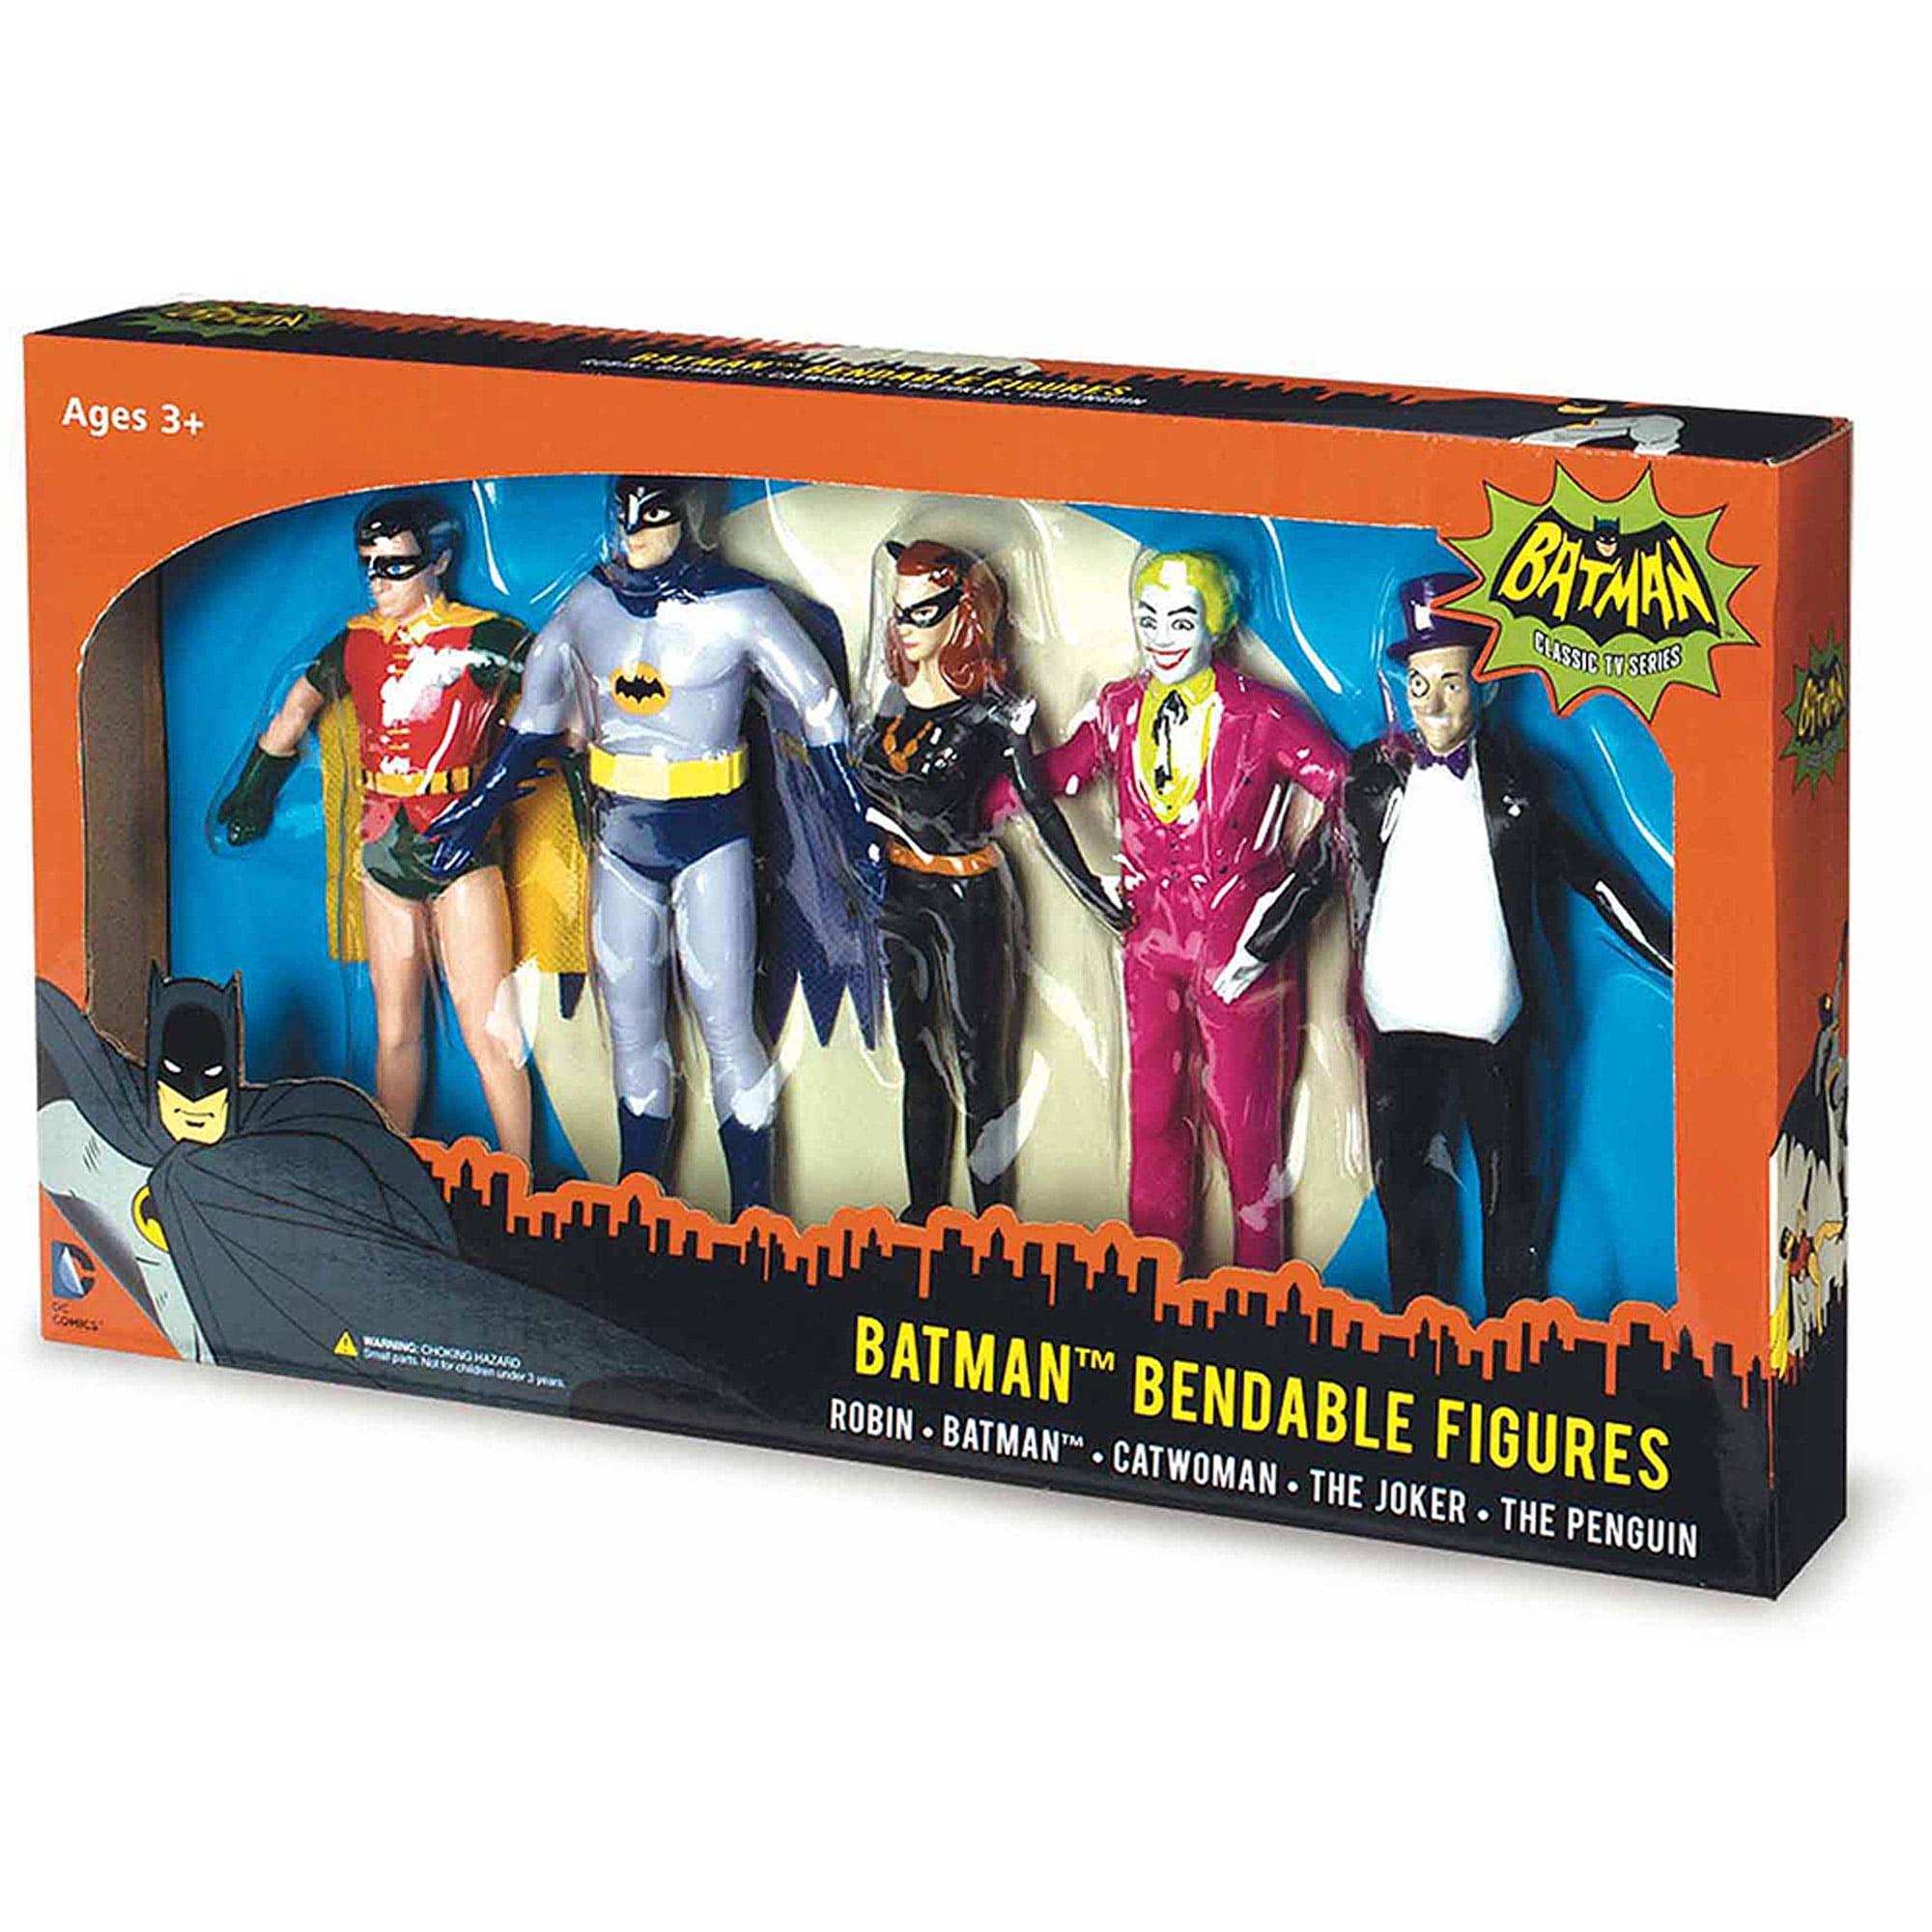 NJ Croce Batman Classic TV Series Bendable Boxed Set, Batman, Robin, Catwoman, The Joker and The Penguin